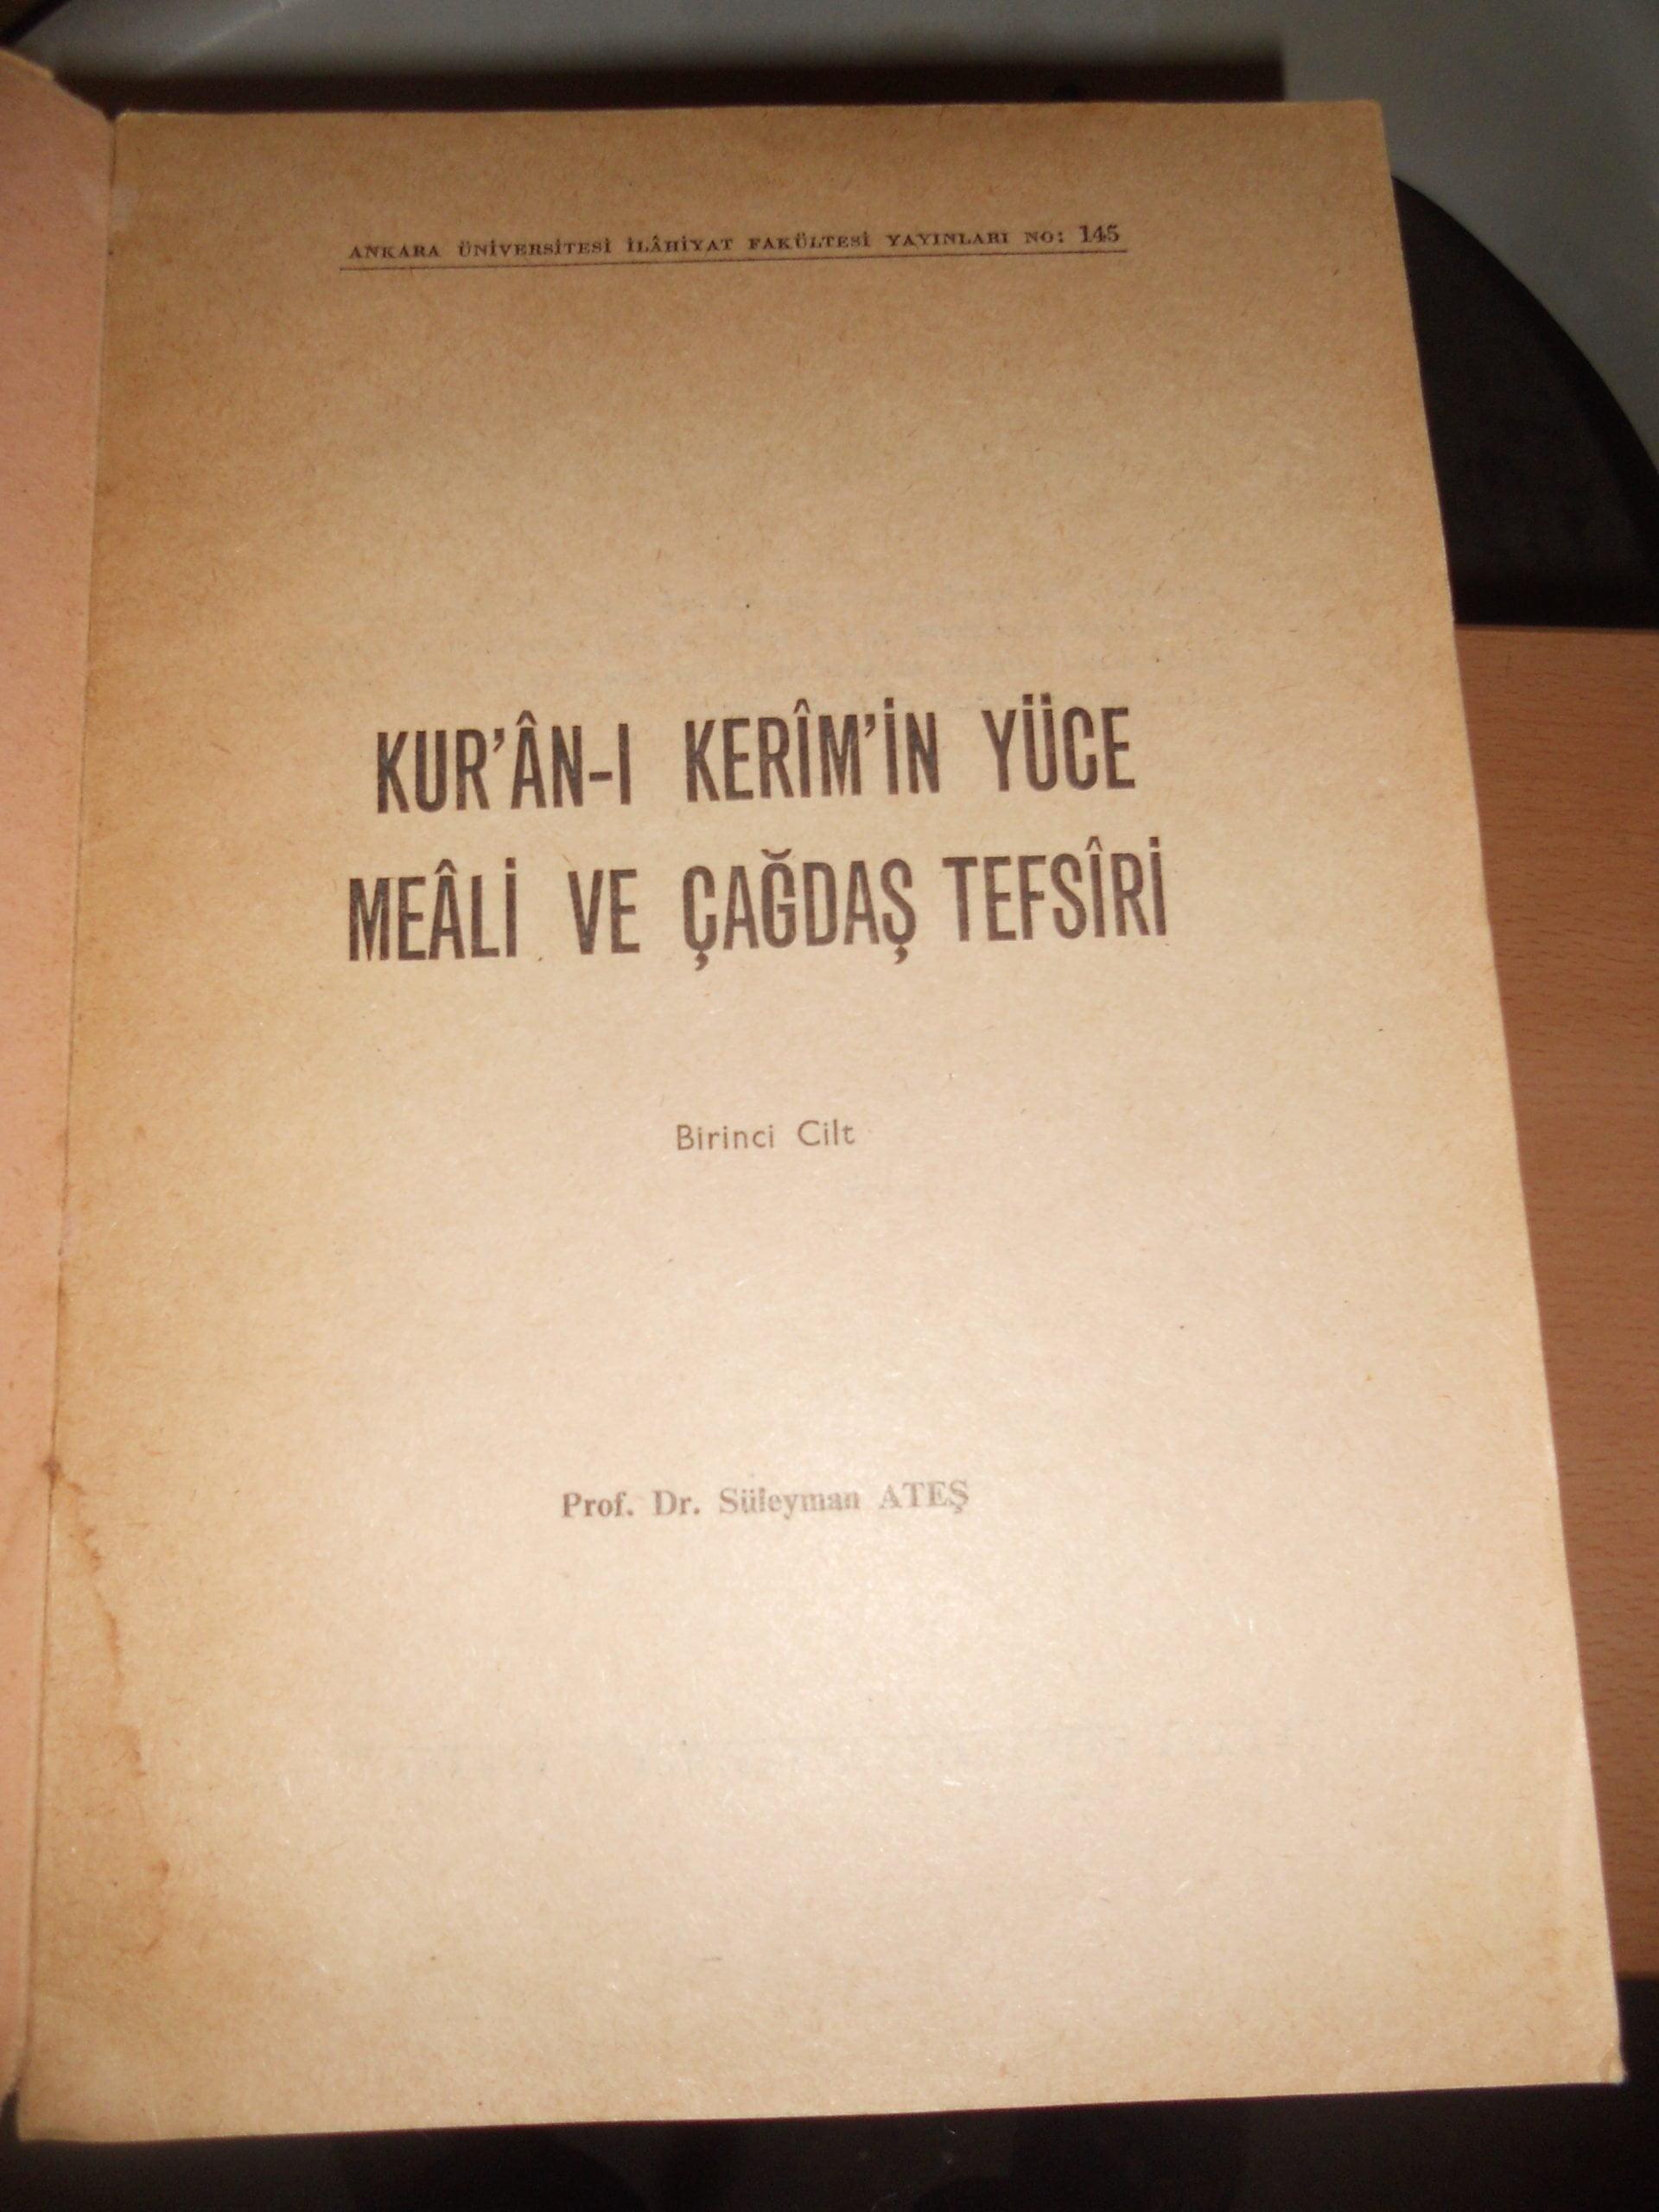 KUR'AN'I KERİM'İN YÜCE MEALİ VE TEFSİRİ-Birinci cilt/Süleyman ATEŞ/25 tl